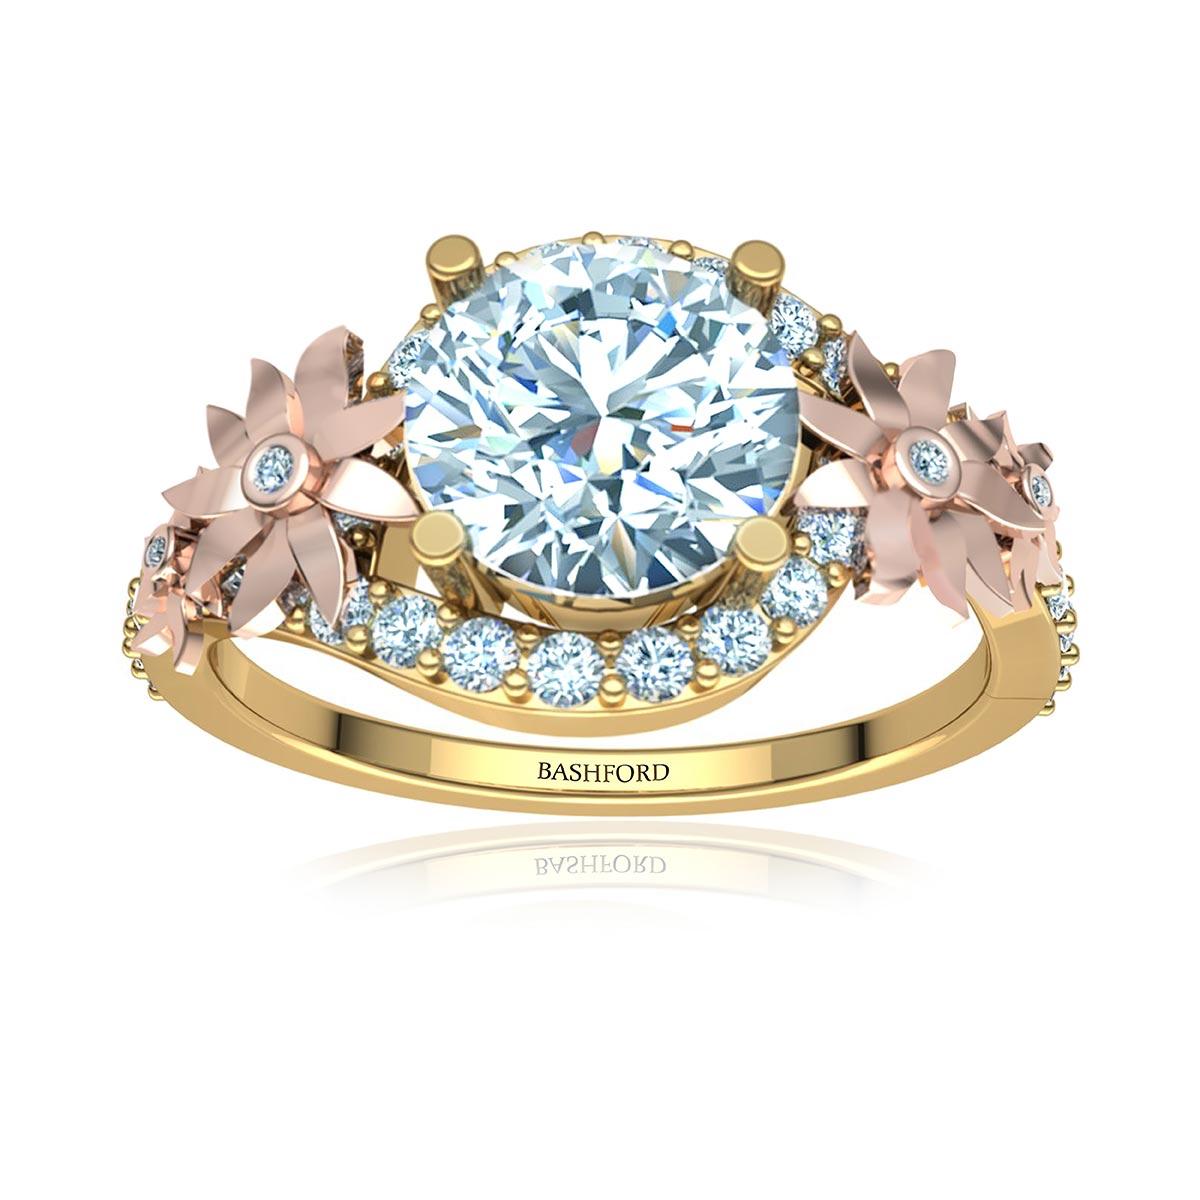 Wisteria Diamond Ring (3/4 CT. TW.)